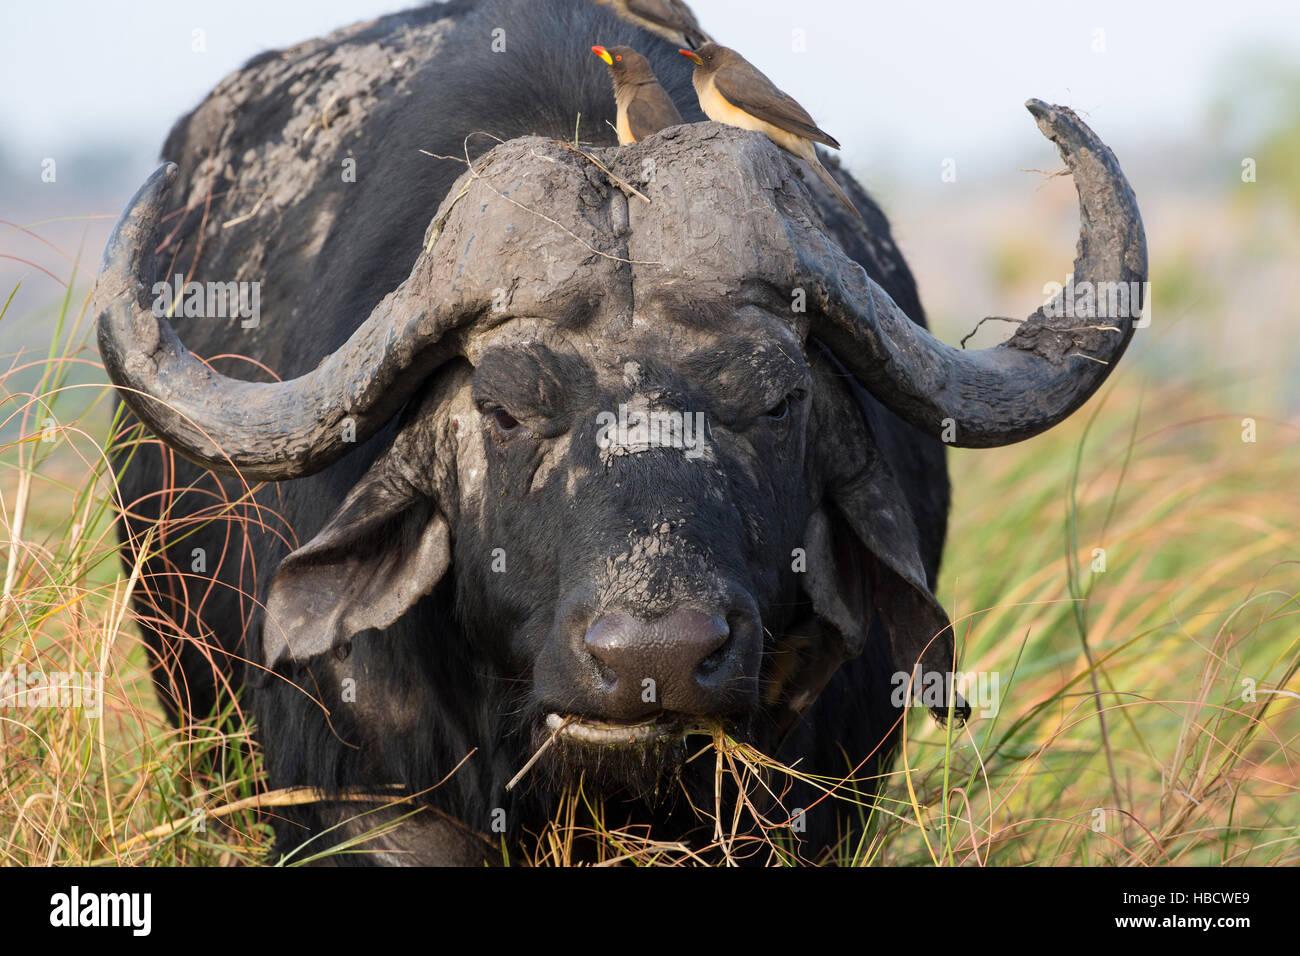 Cape buffalo (Syncerus caffer) with yellowbilled oxpeckers (Buphagus africanus), Chobe river, Botswana - Stock Image